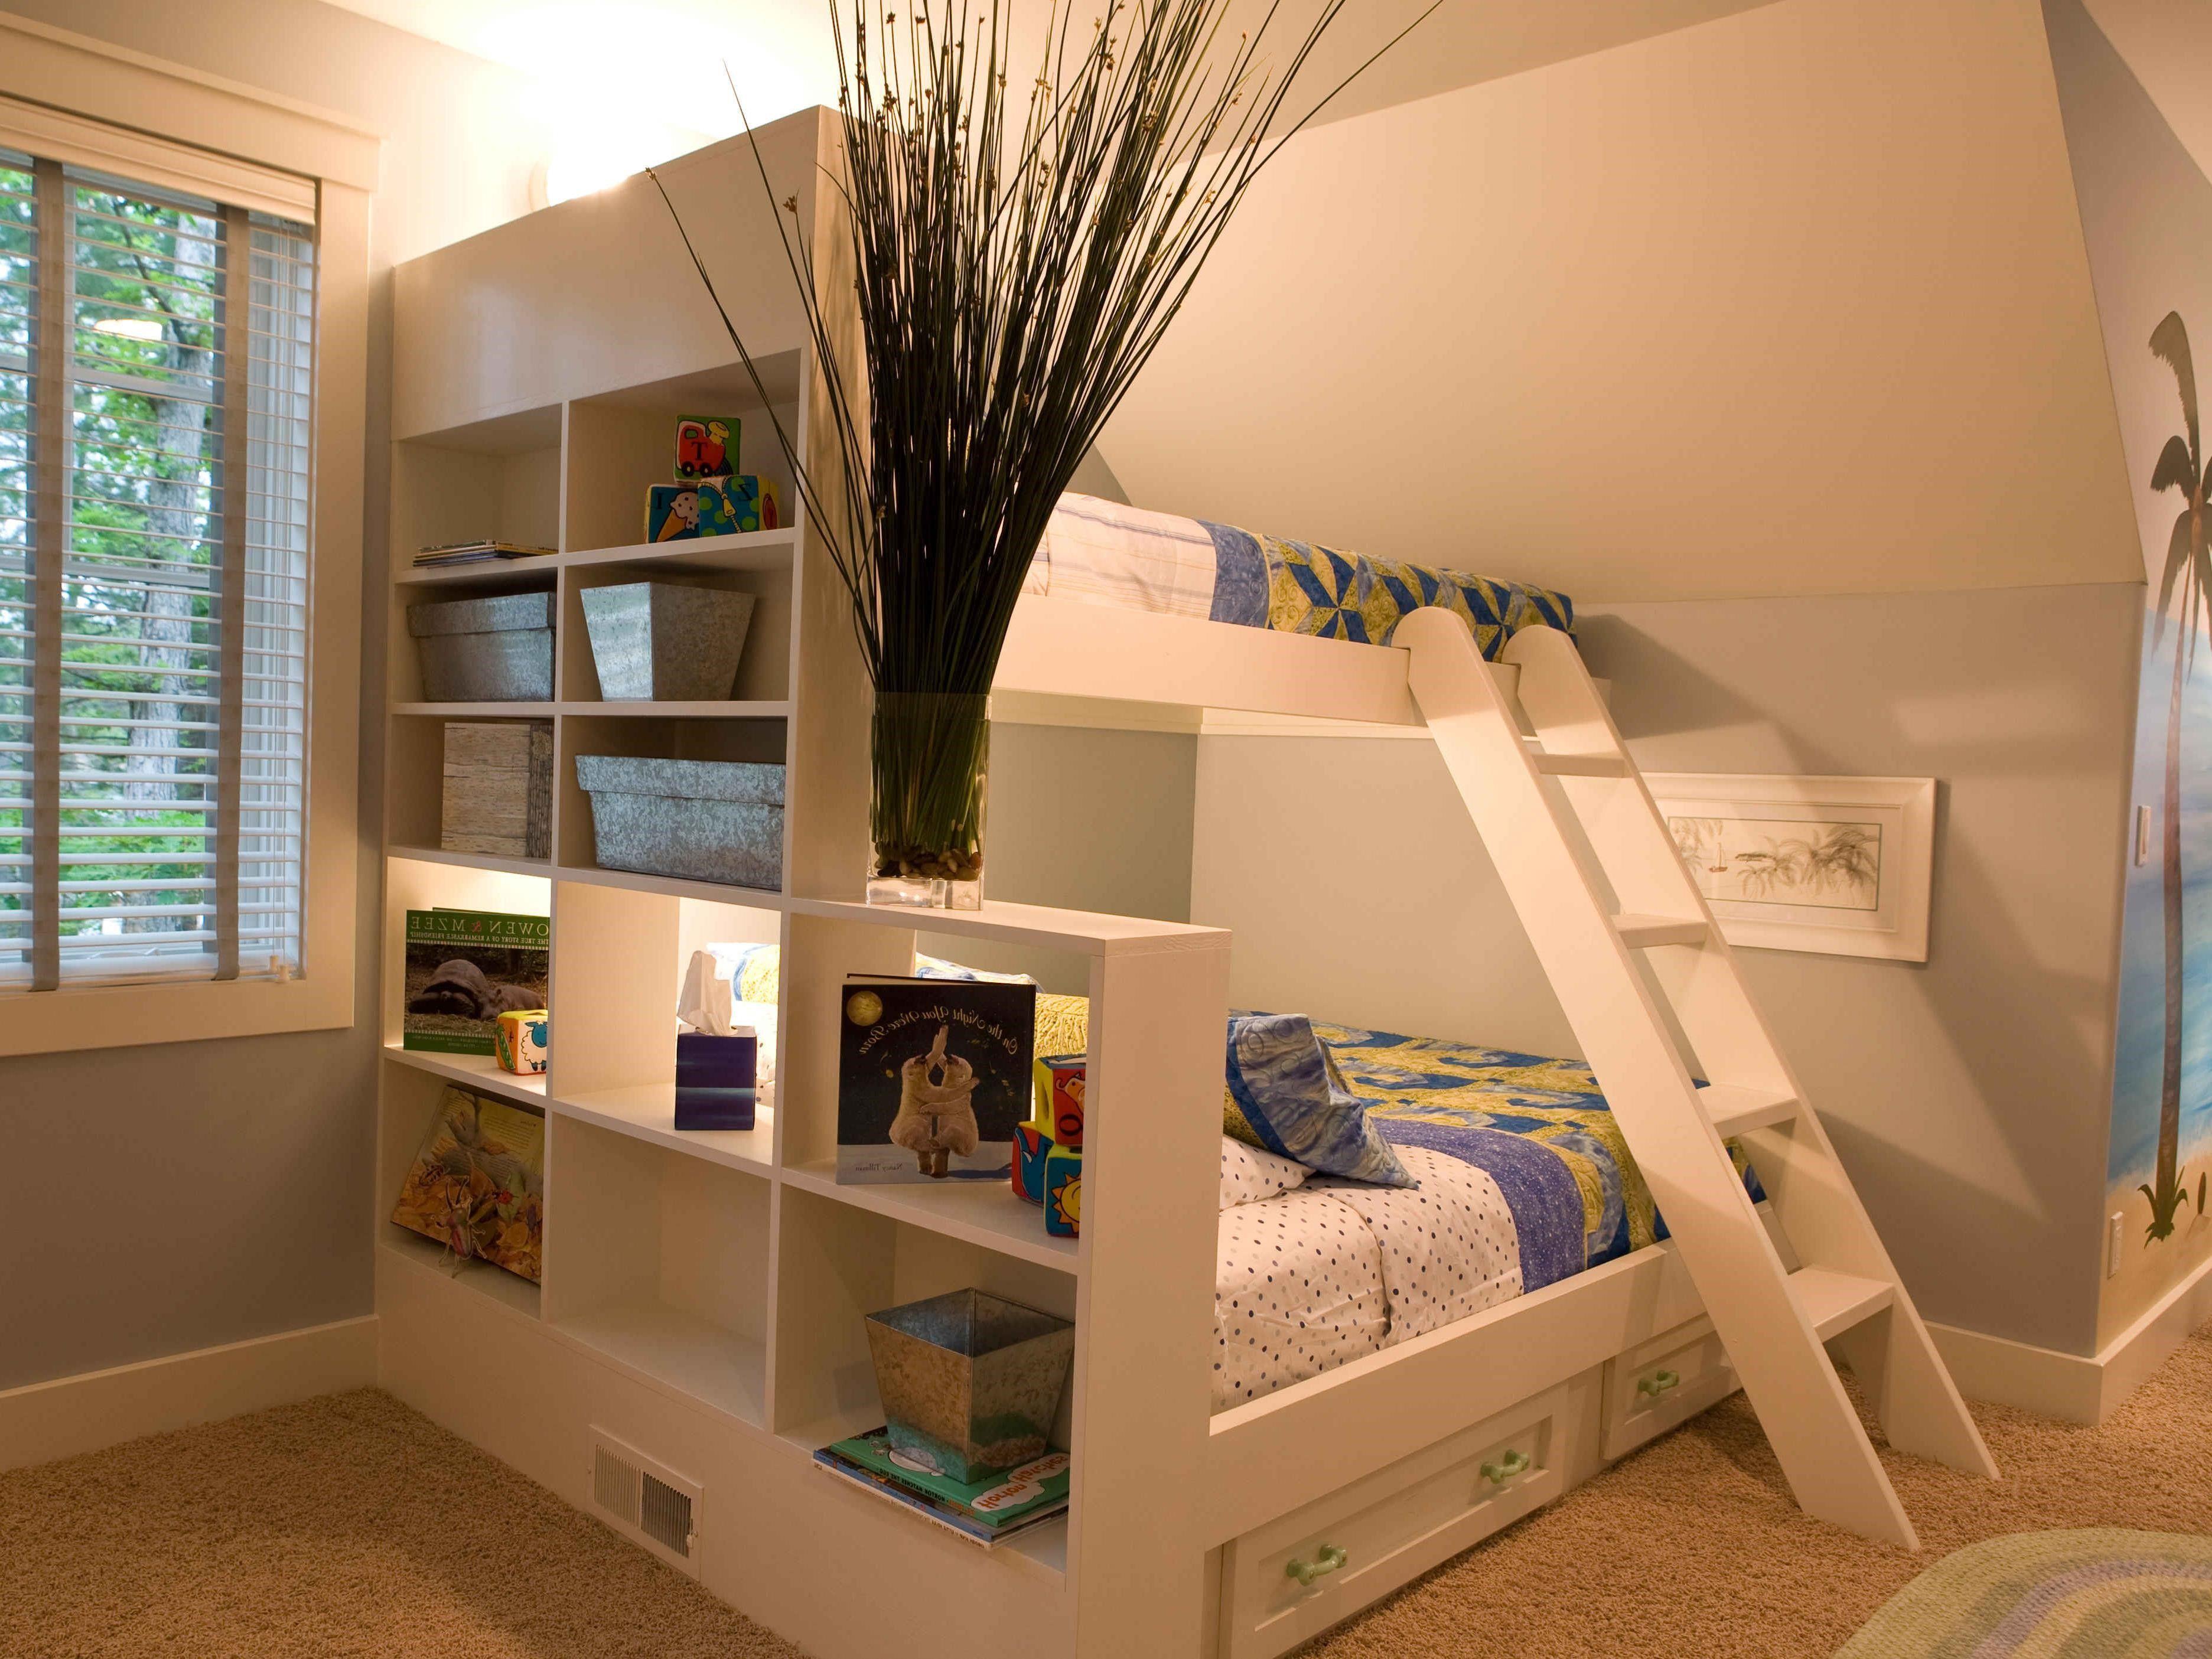 Unique Homemade Furniture Ideas Cool Loft Beds Bunk Bed Designs